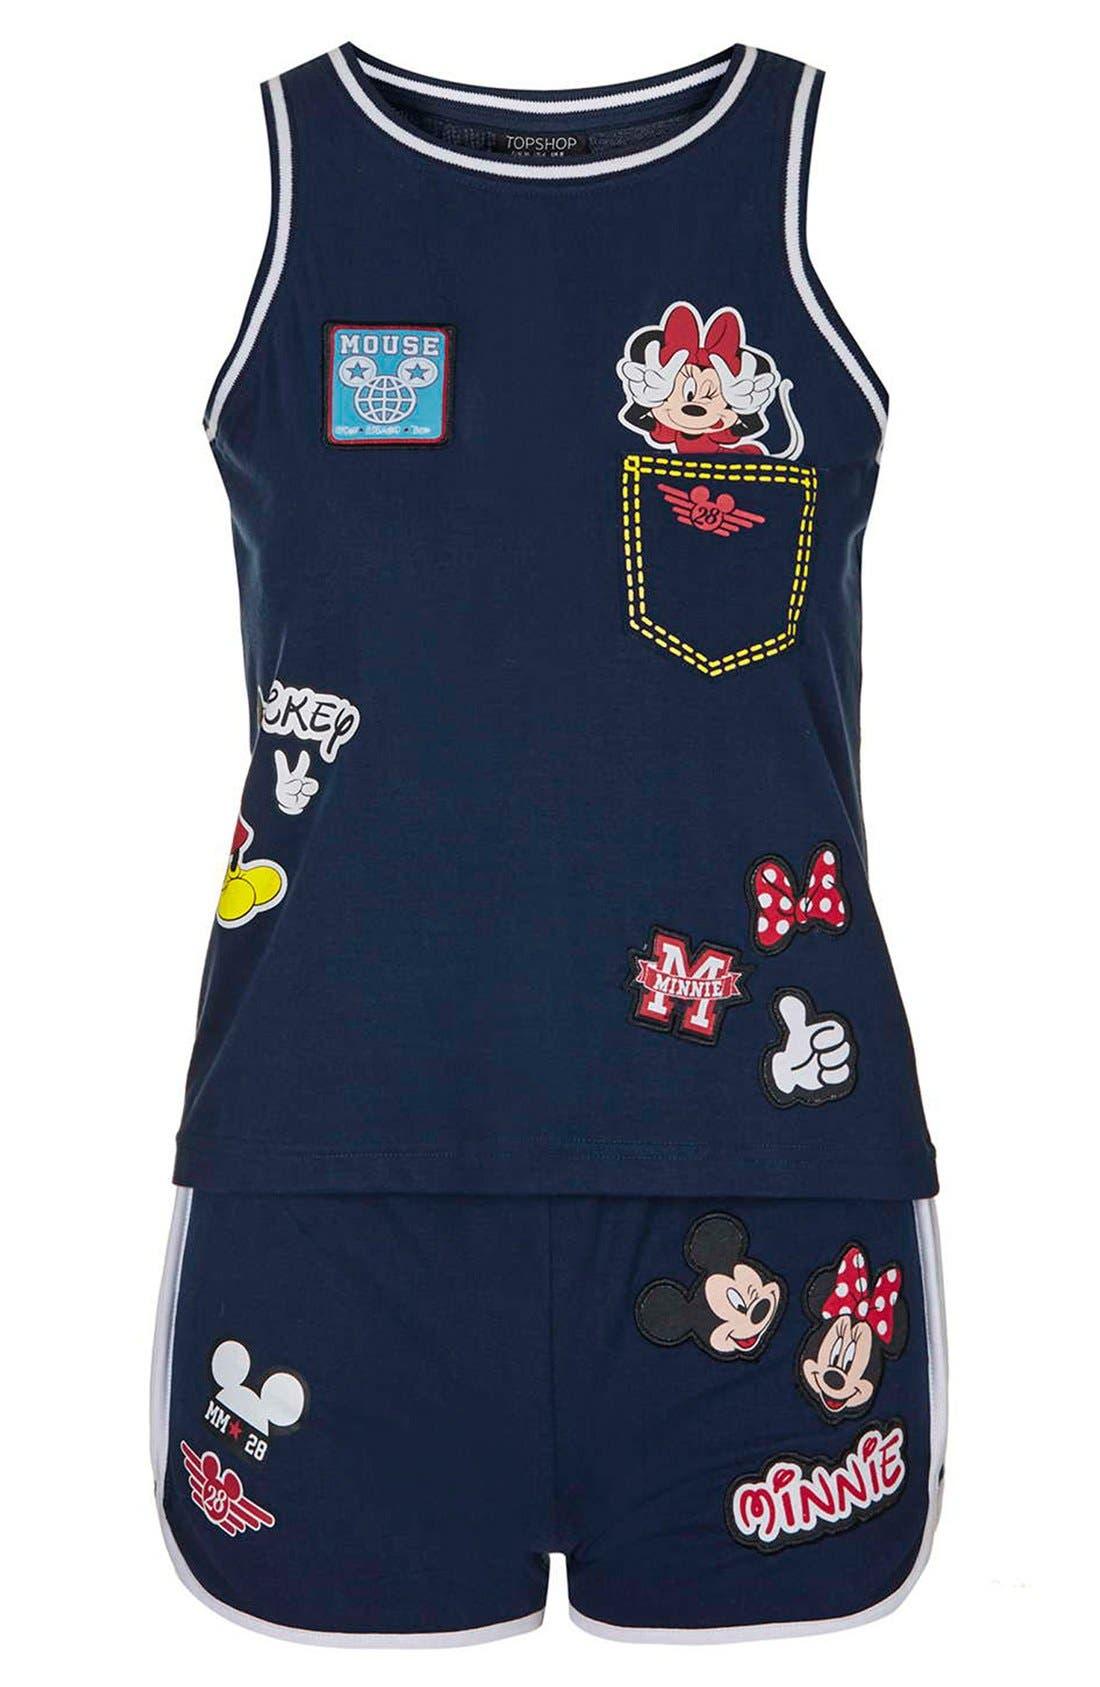 'Mickey & Minnie Mouse' Pajamas,                             Alternate thumbnail 2, color,                             410